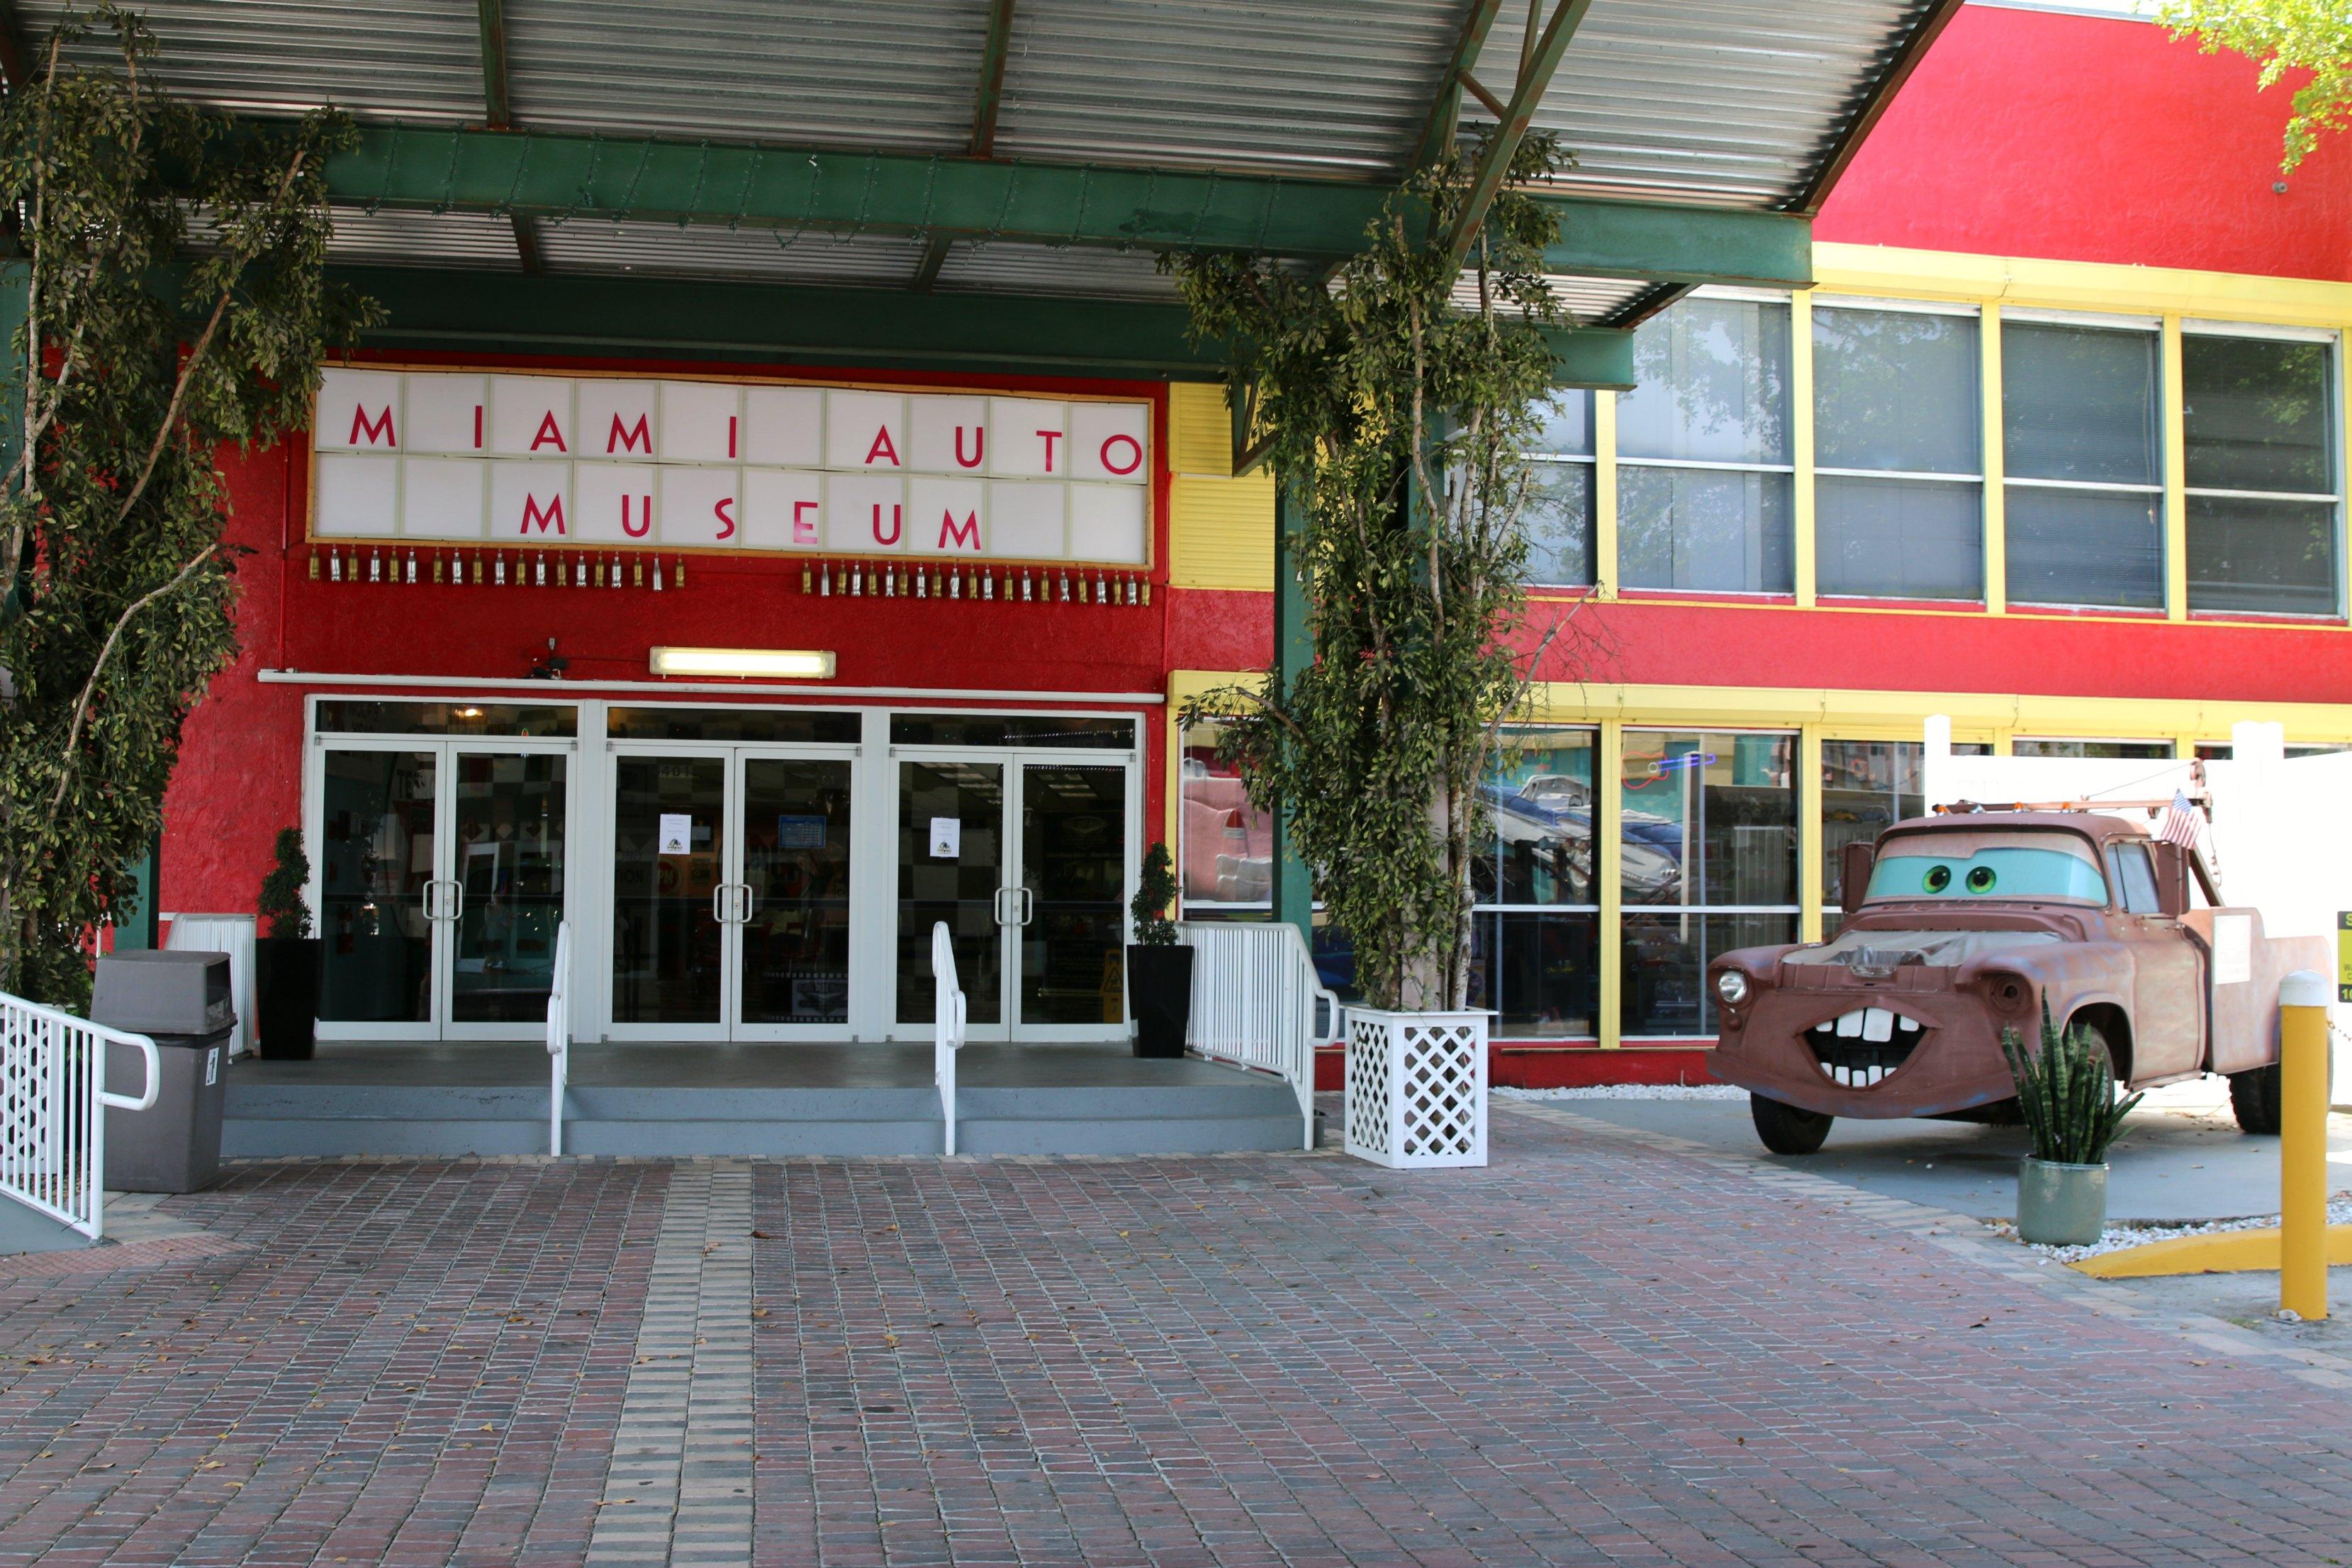 Miami Auto Museum Review